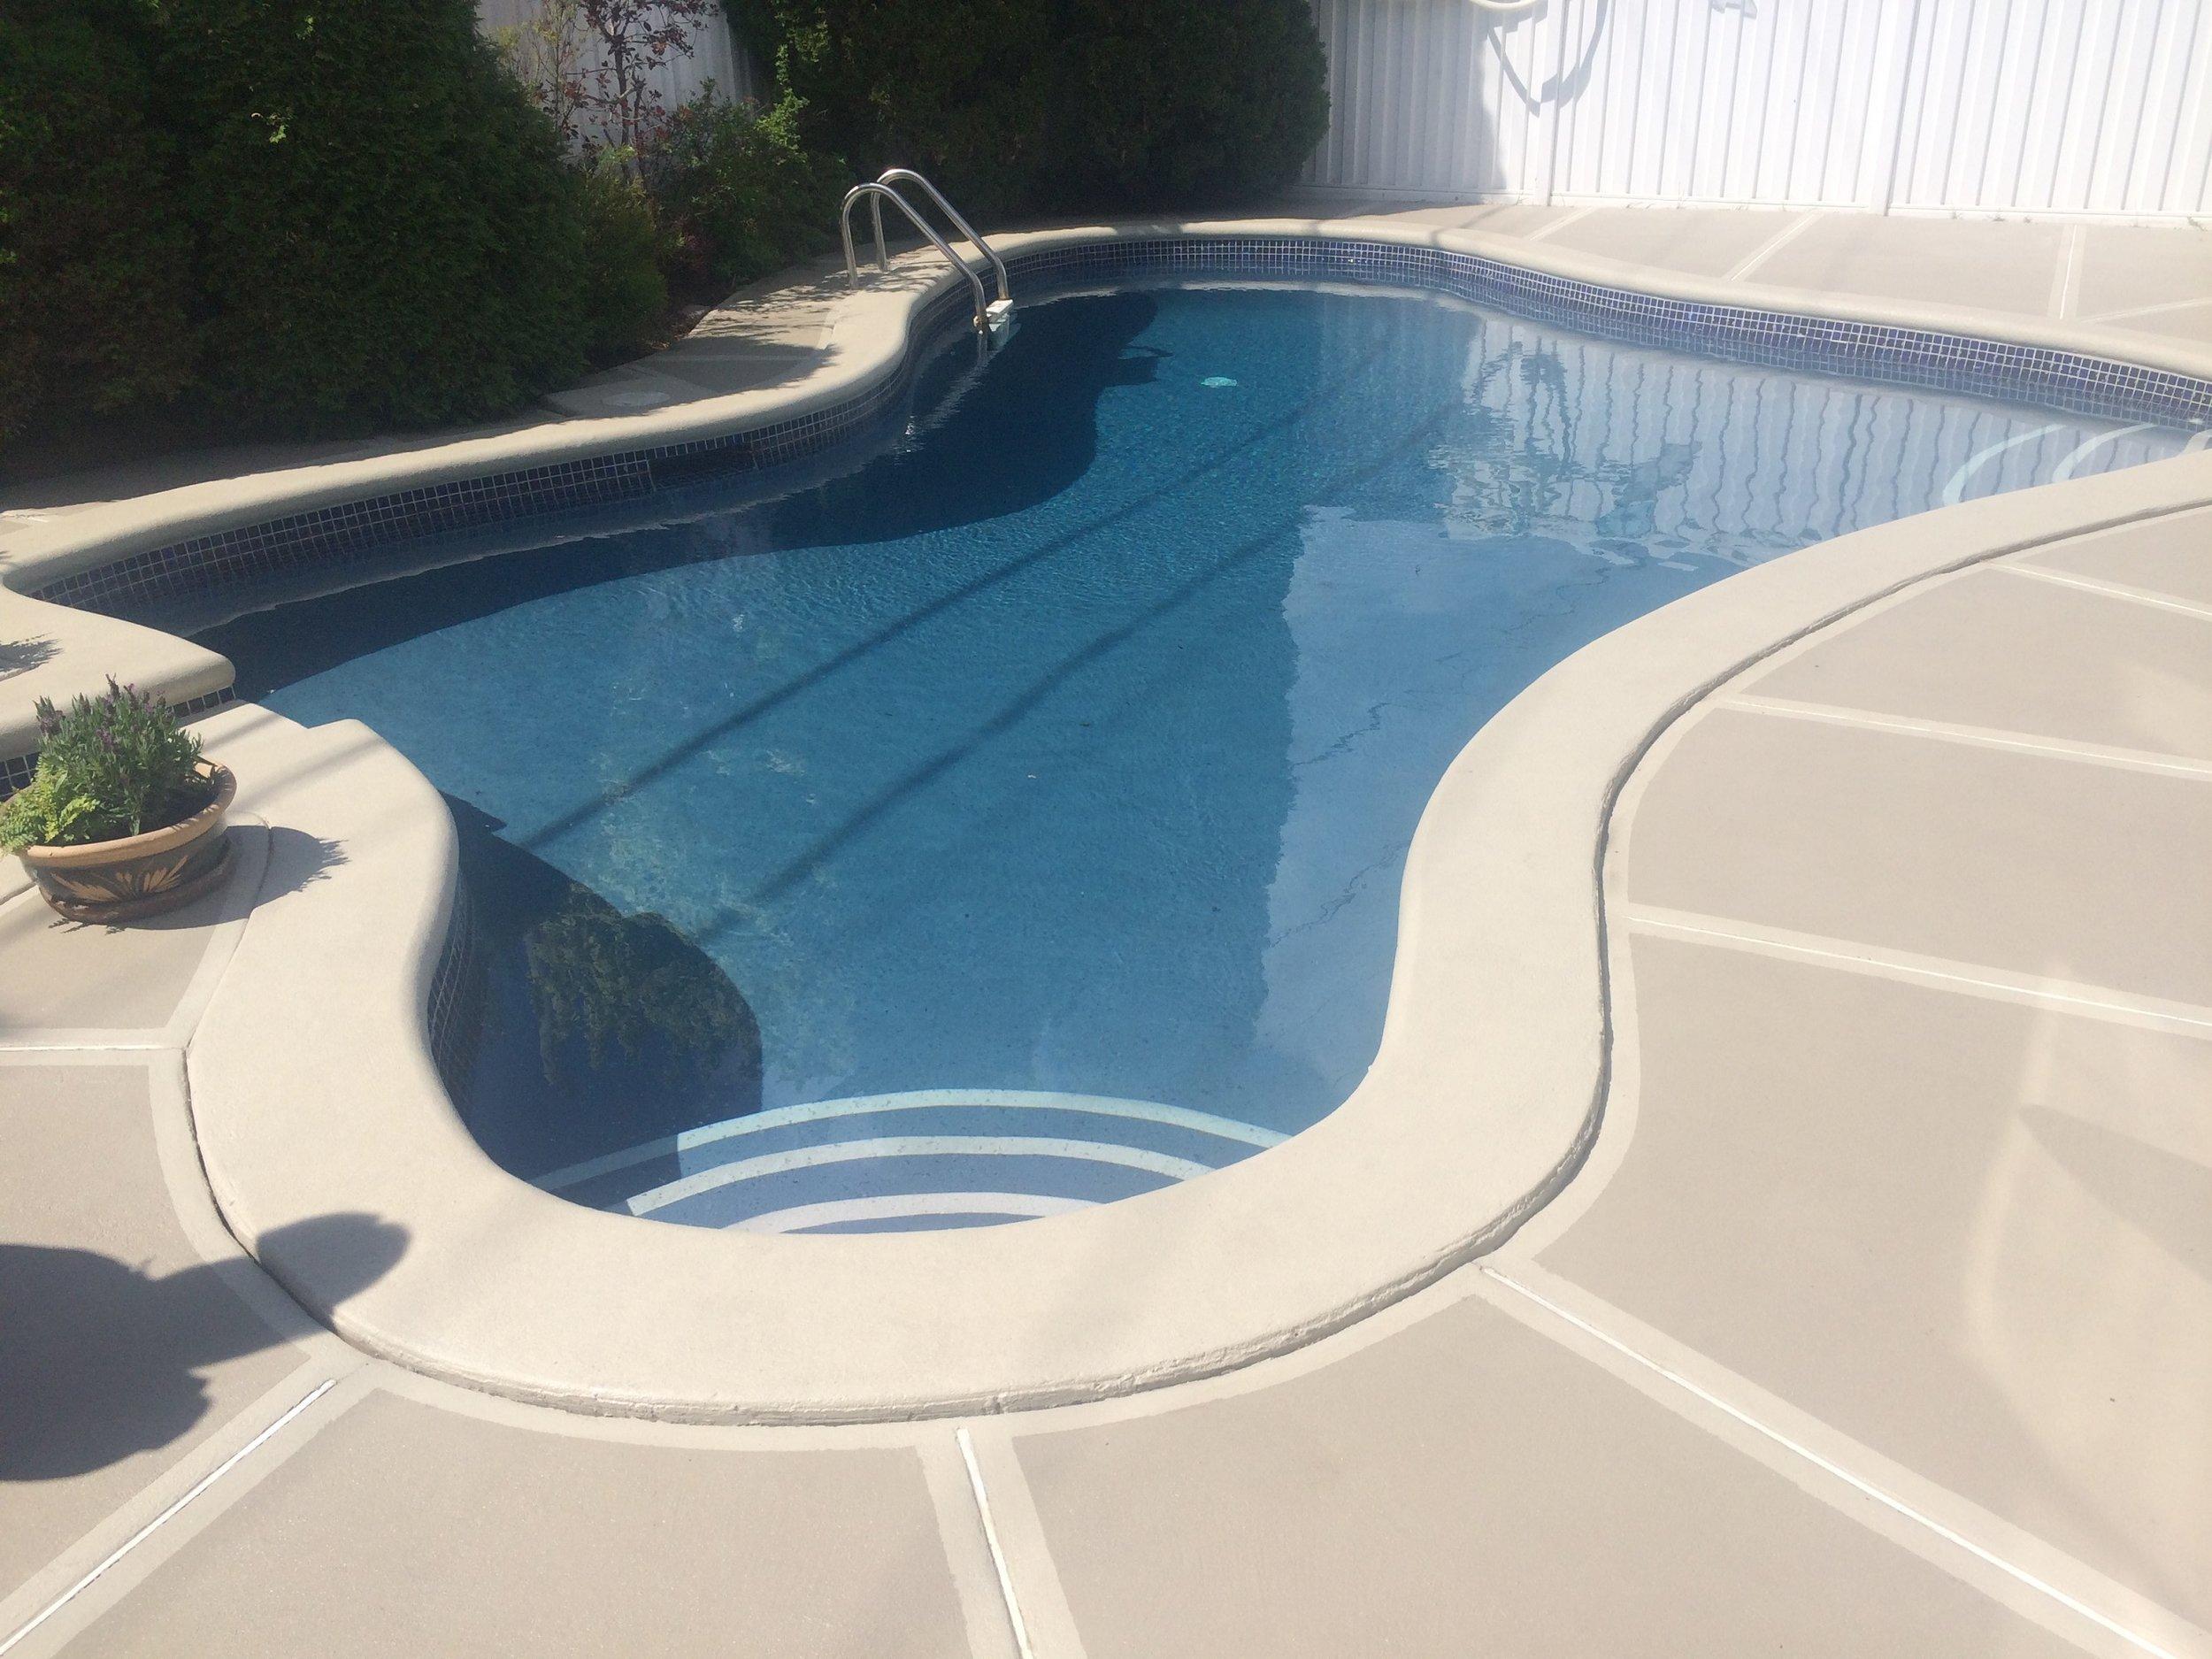 poseidon pool with light accent steps.jpg